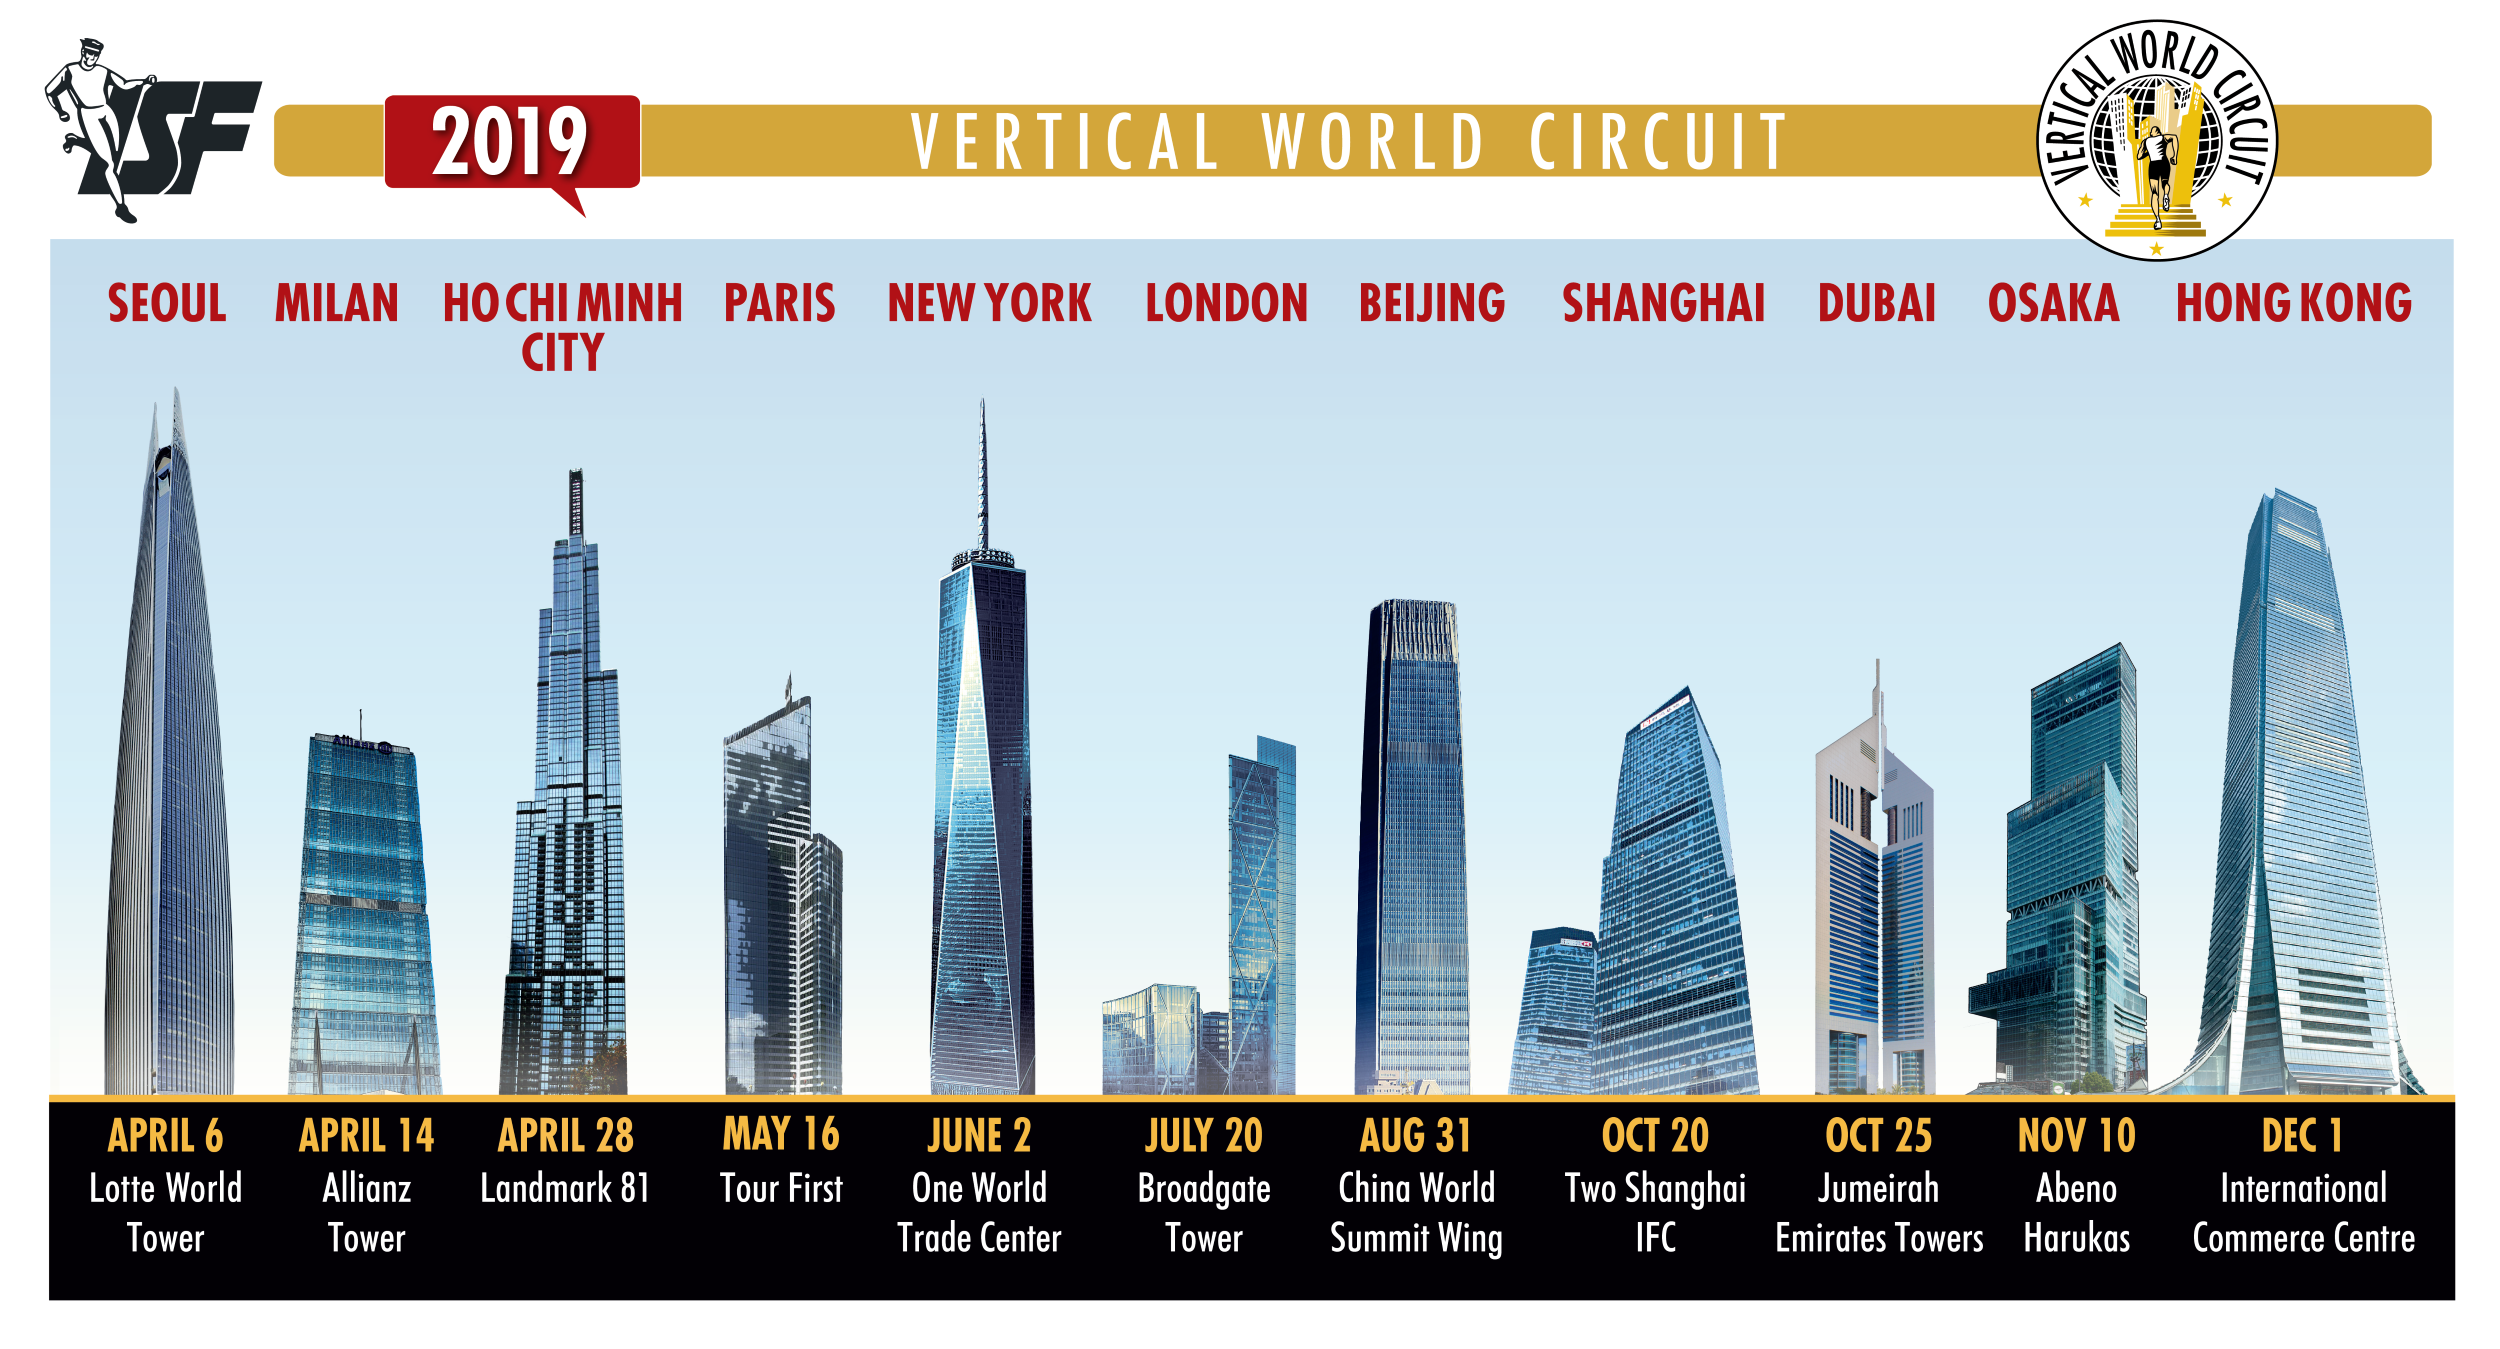 2019VWC(バーティカルワールドサーキット)は世界11の主要都市で開催される。都市の最高峰に駆け登る都市型スカイランニング。